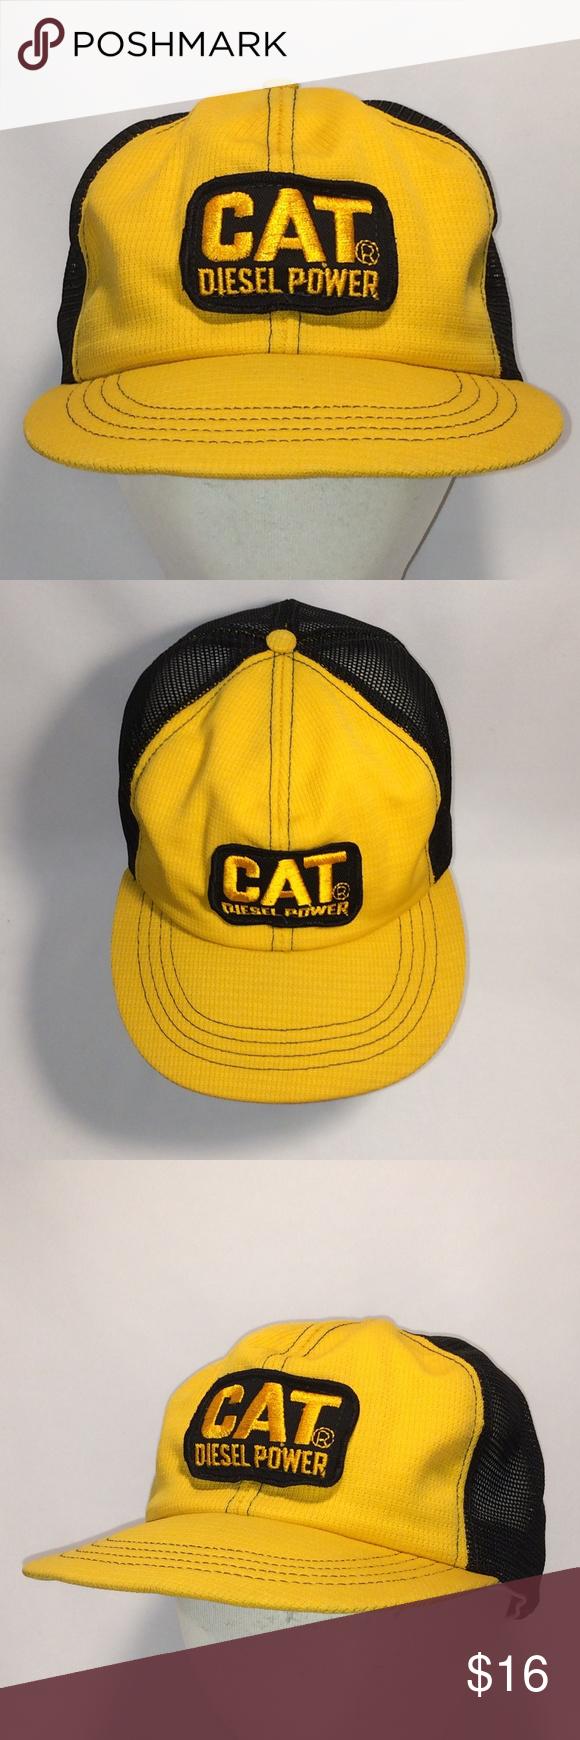 Cat Diesel Power Cowboy Hat